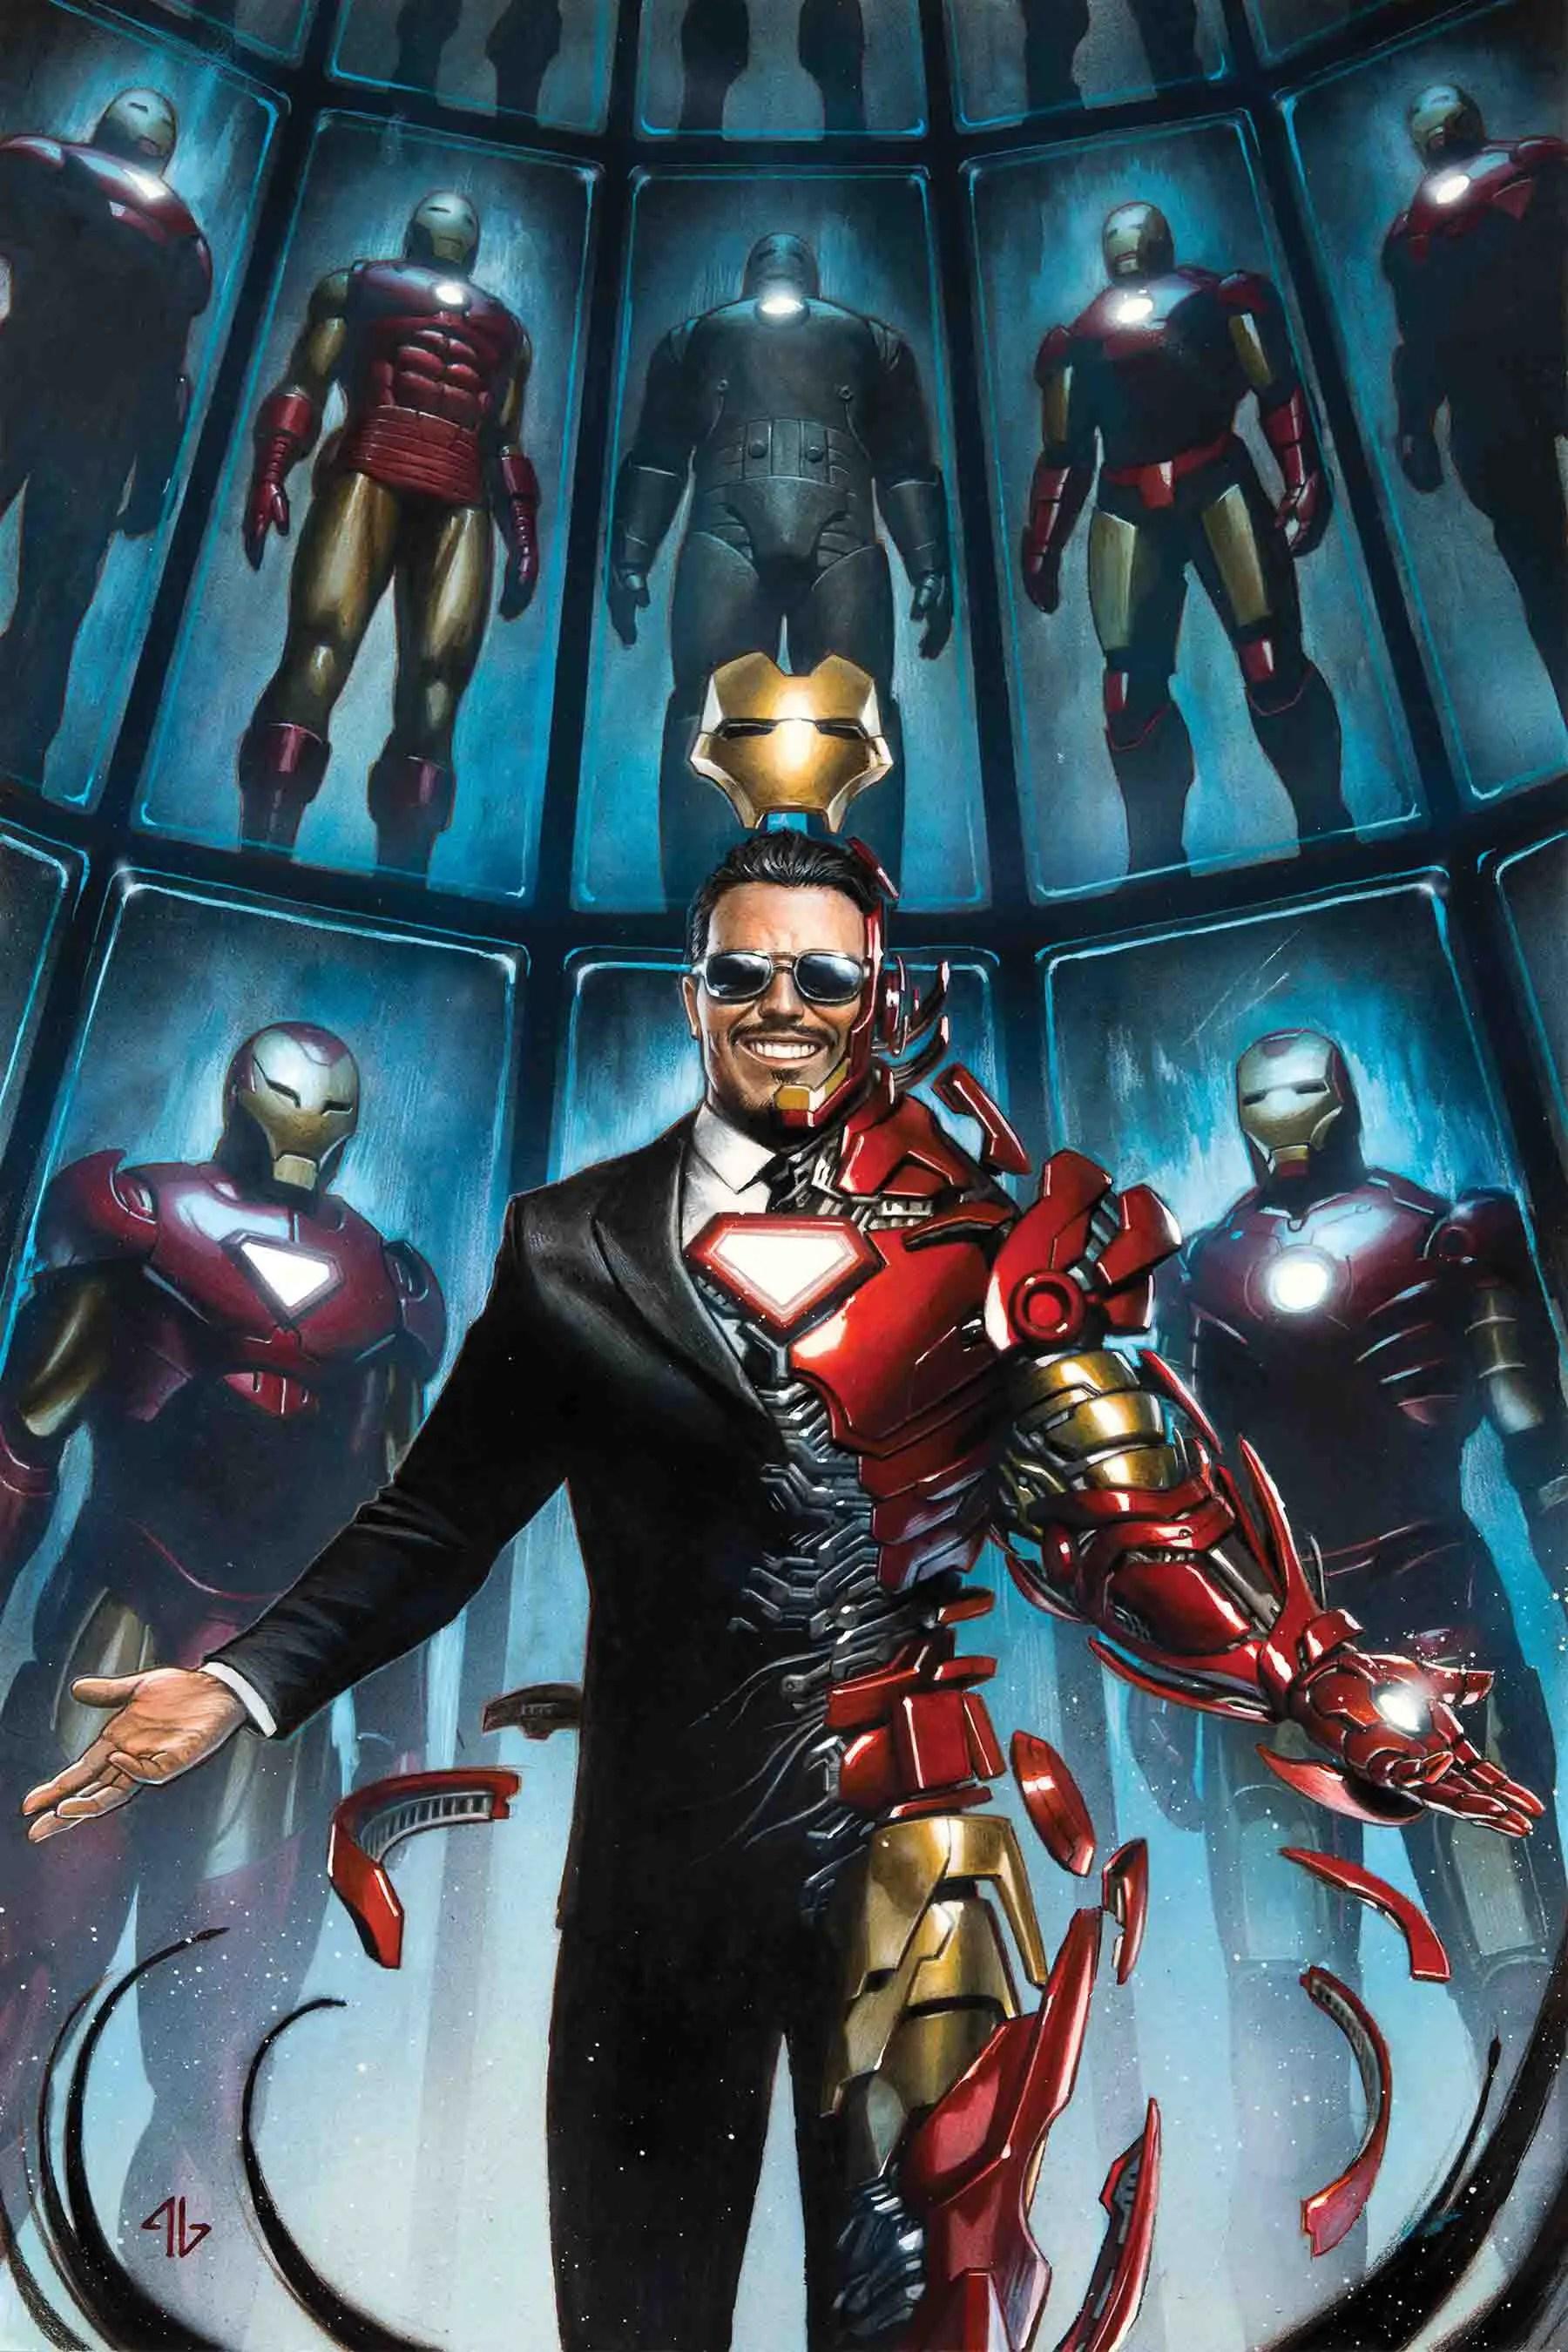 'Tony Stark: Iron Man #1' review: Fun and inventive just as Tony Stark should be